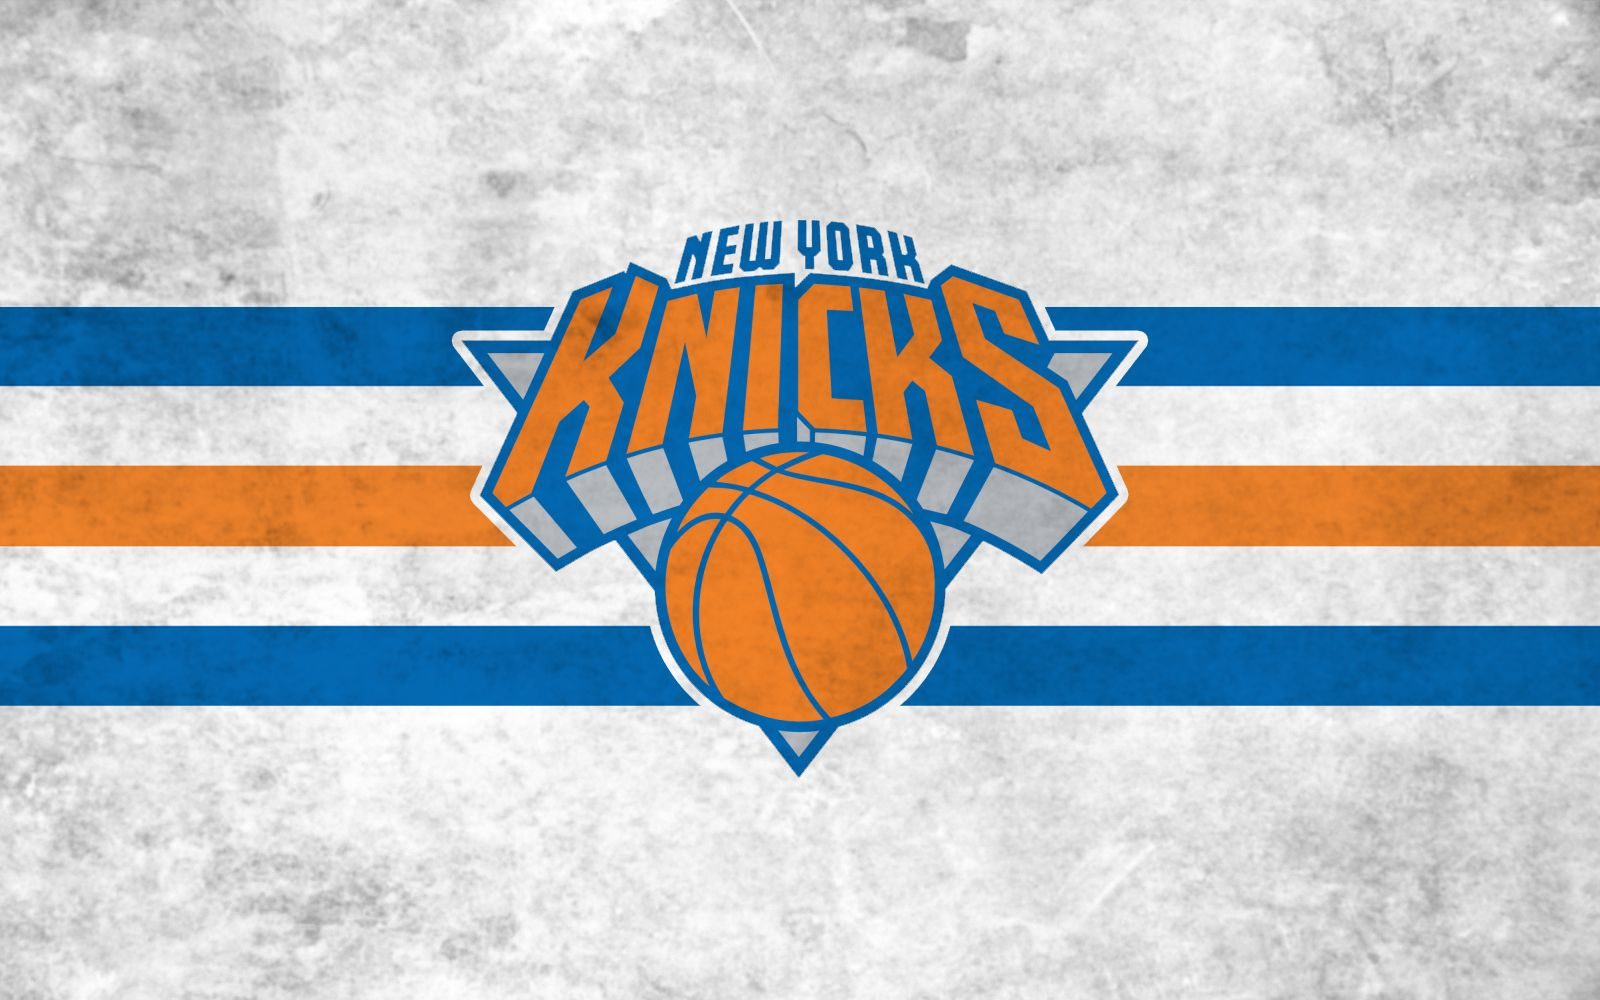 New York Knicks HD Wallpapers Nba new york, New york